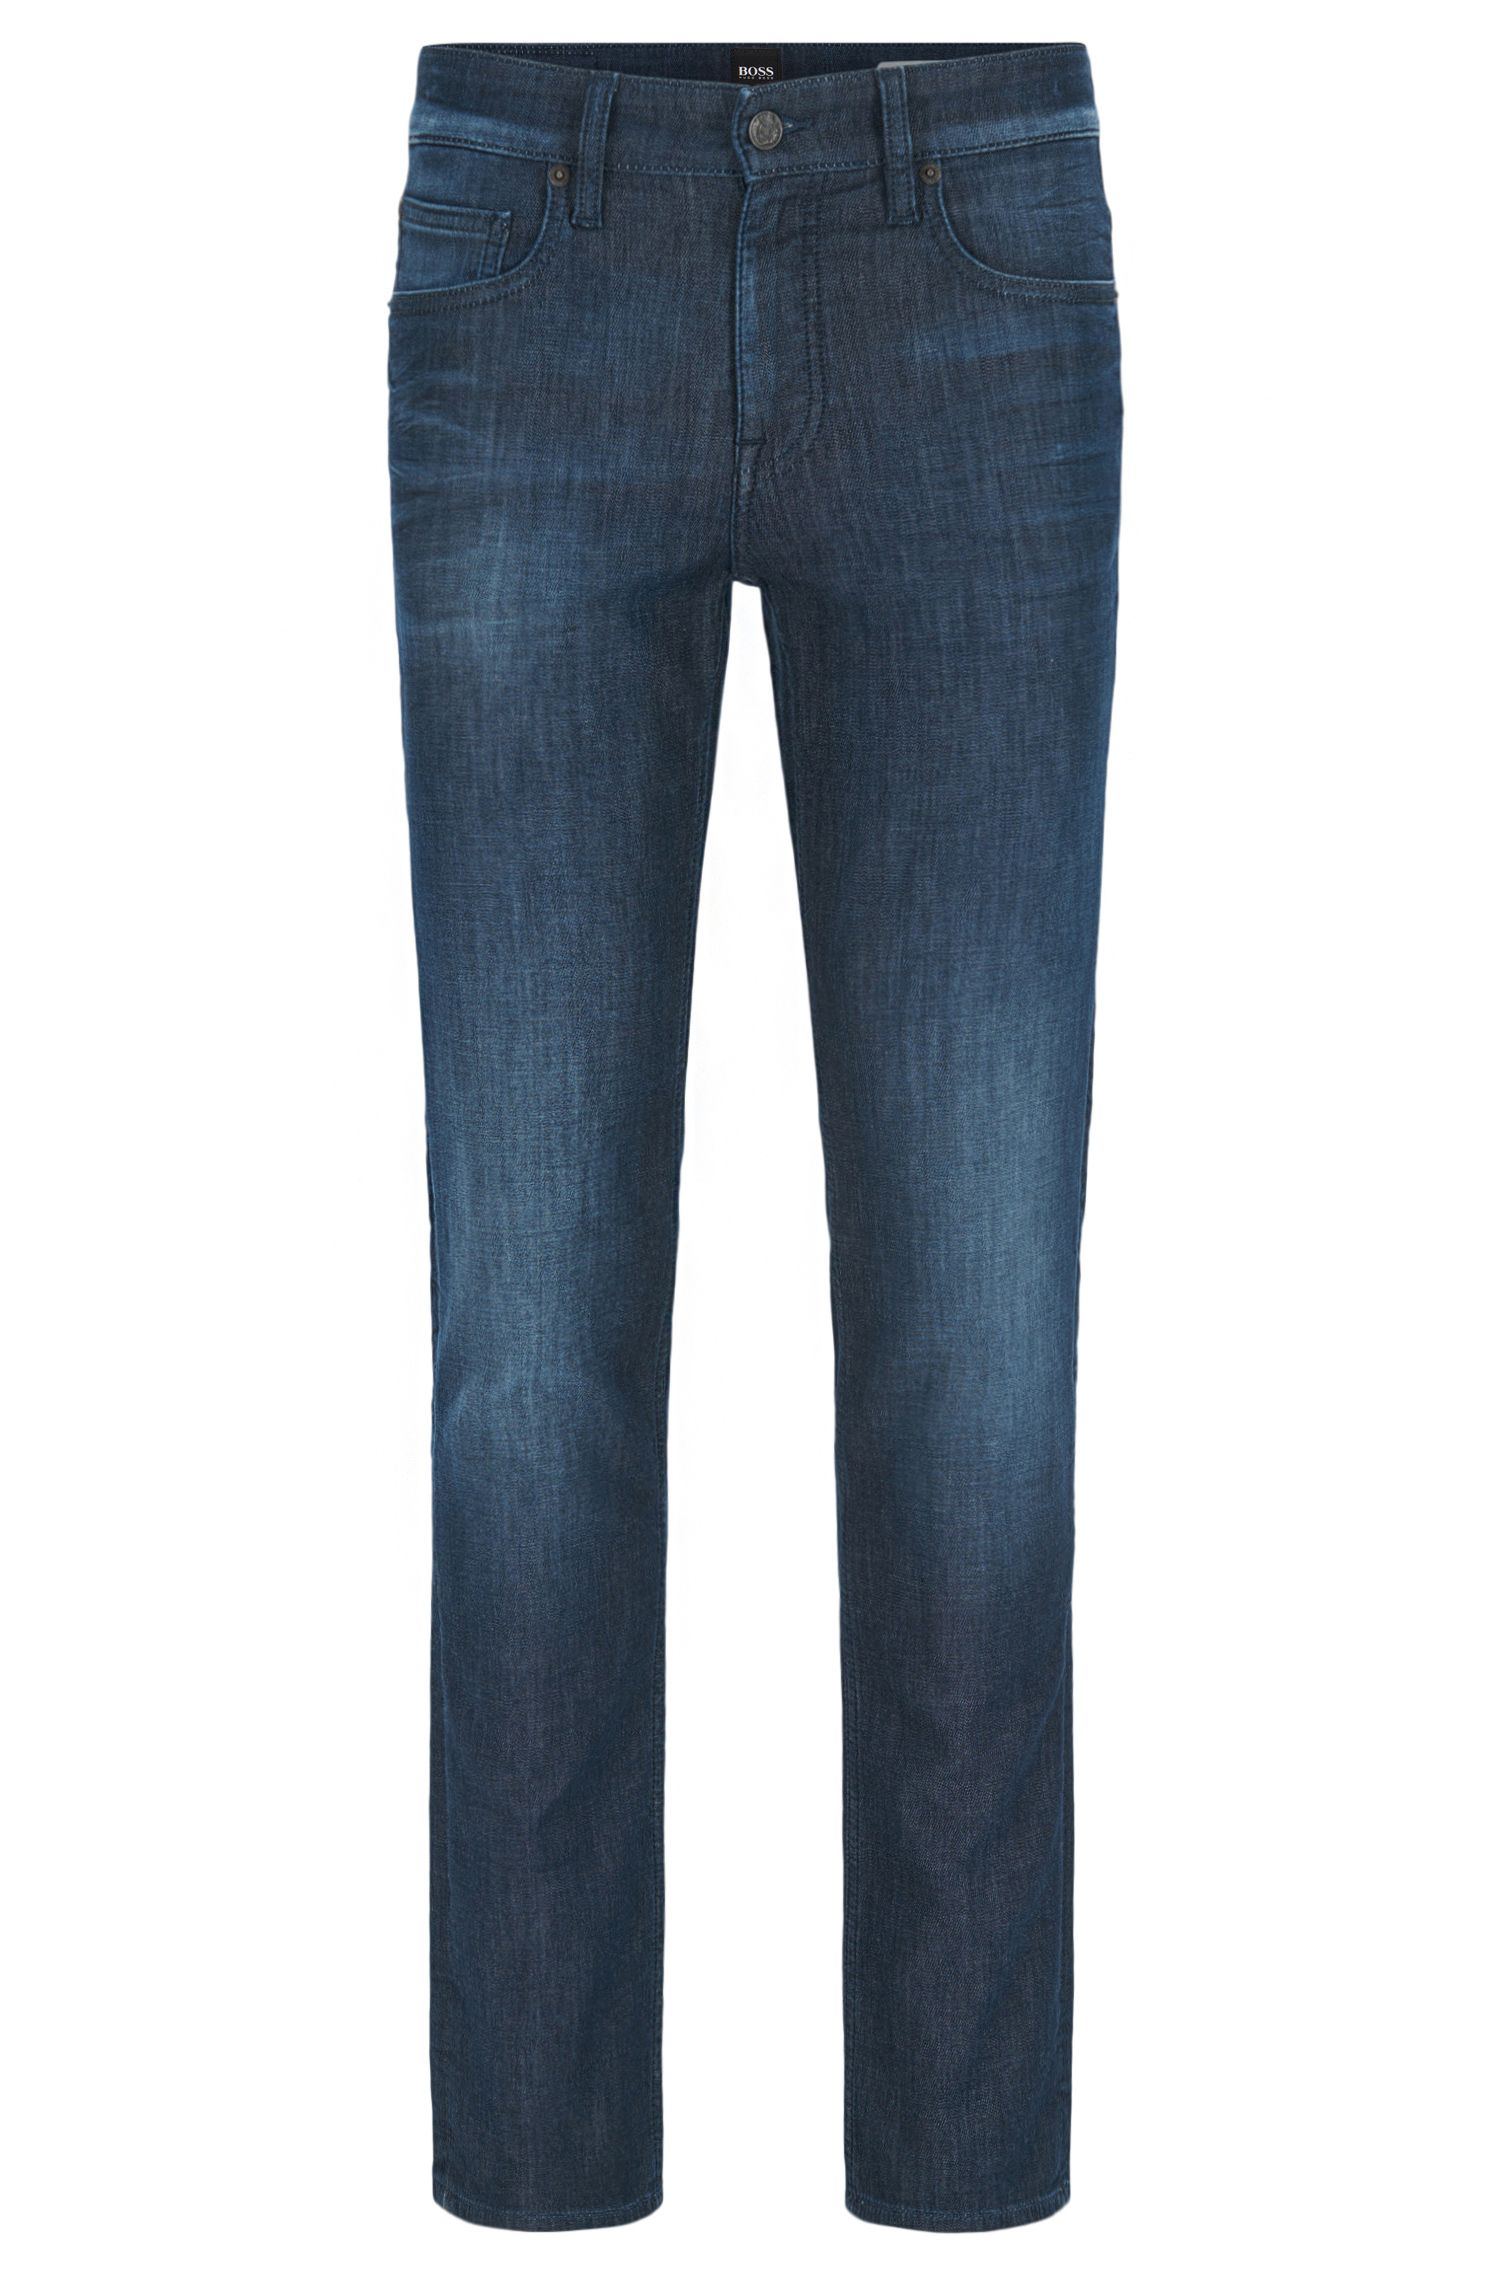 Stretch Cotton Jean, Slim Fit | Orange63 Helsinki-P